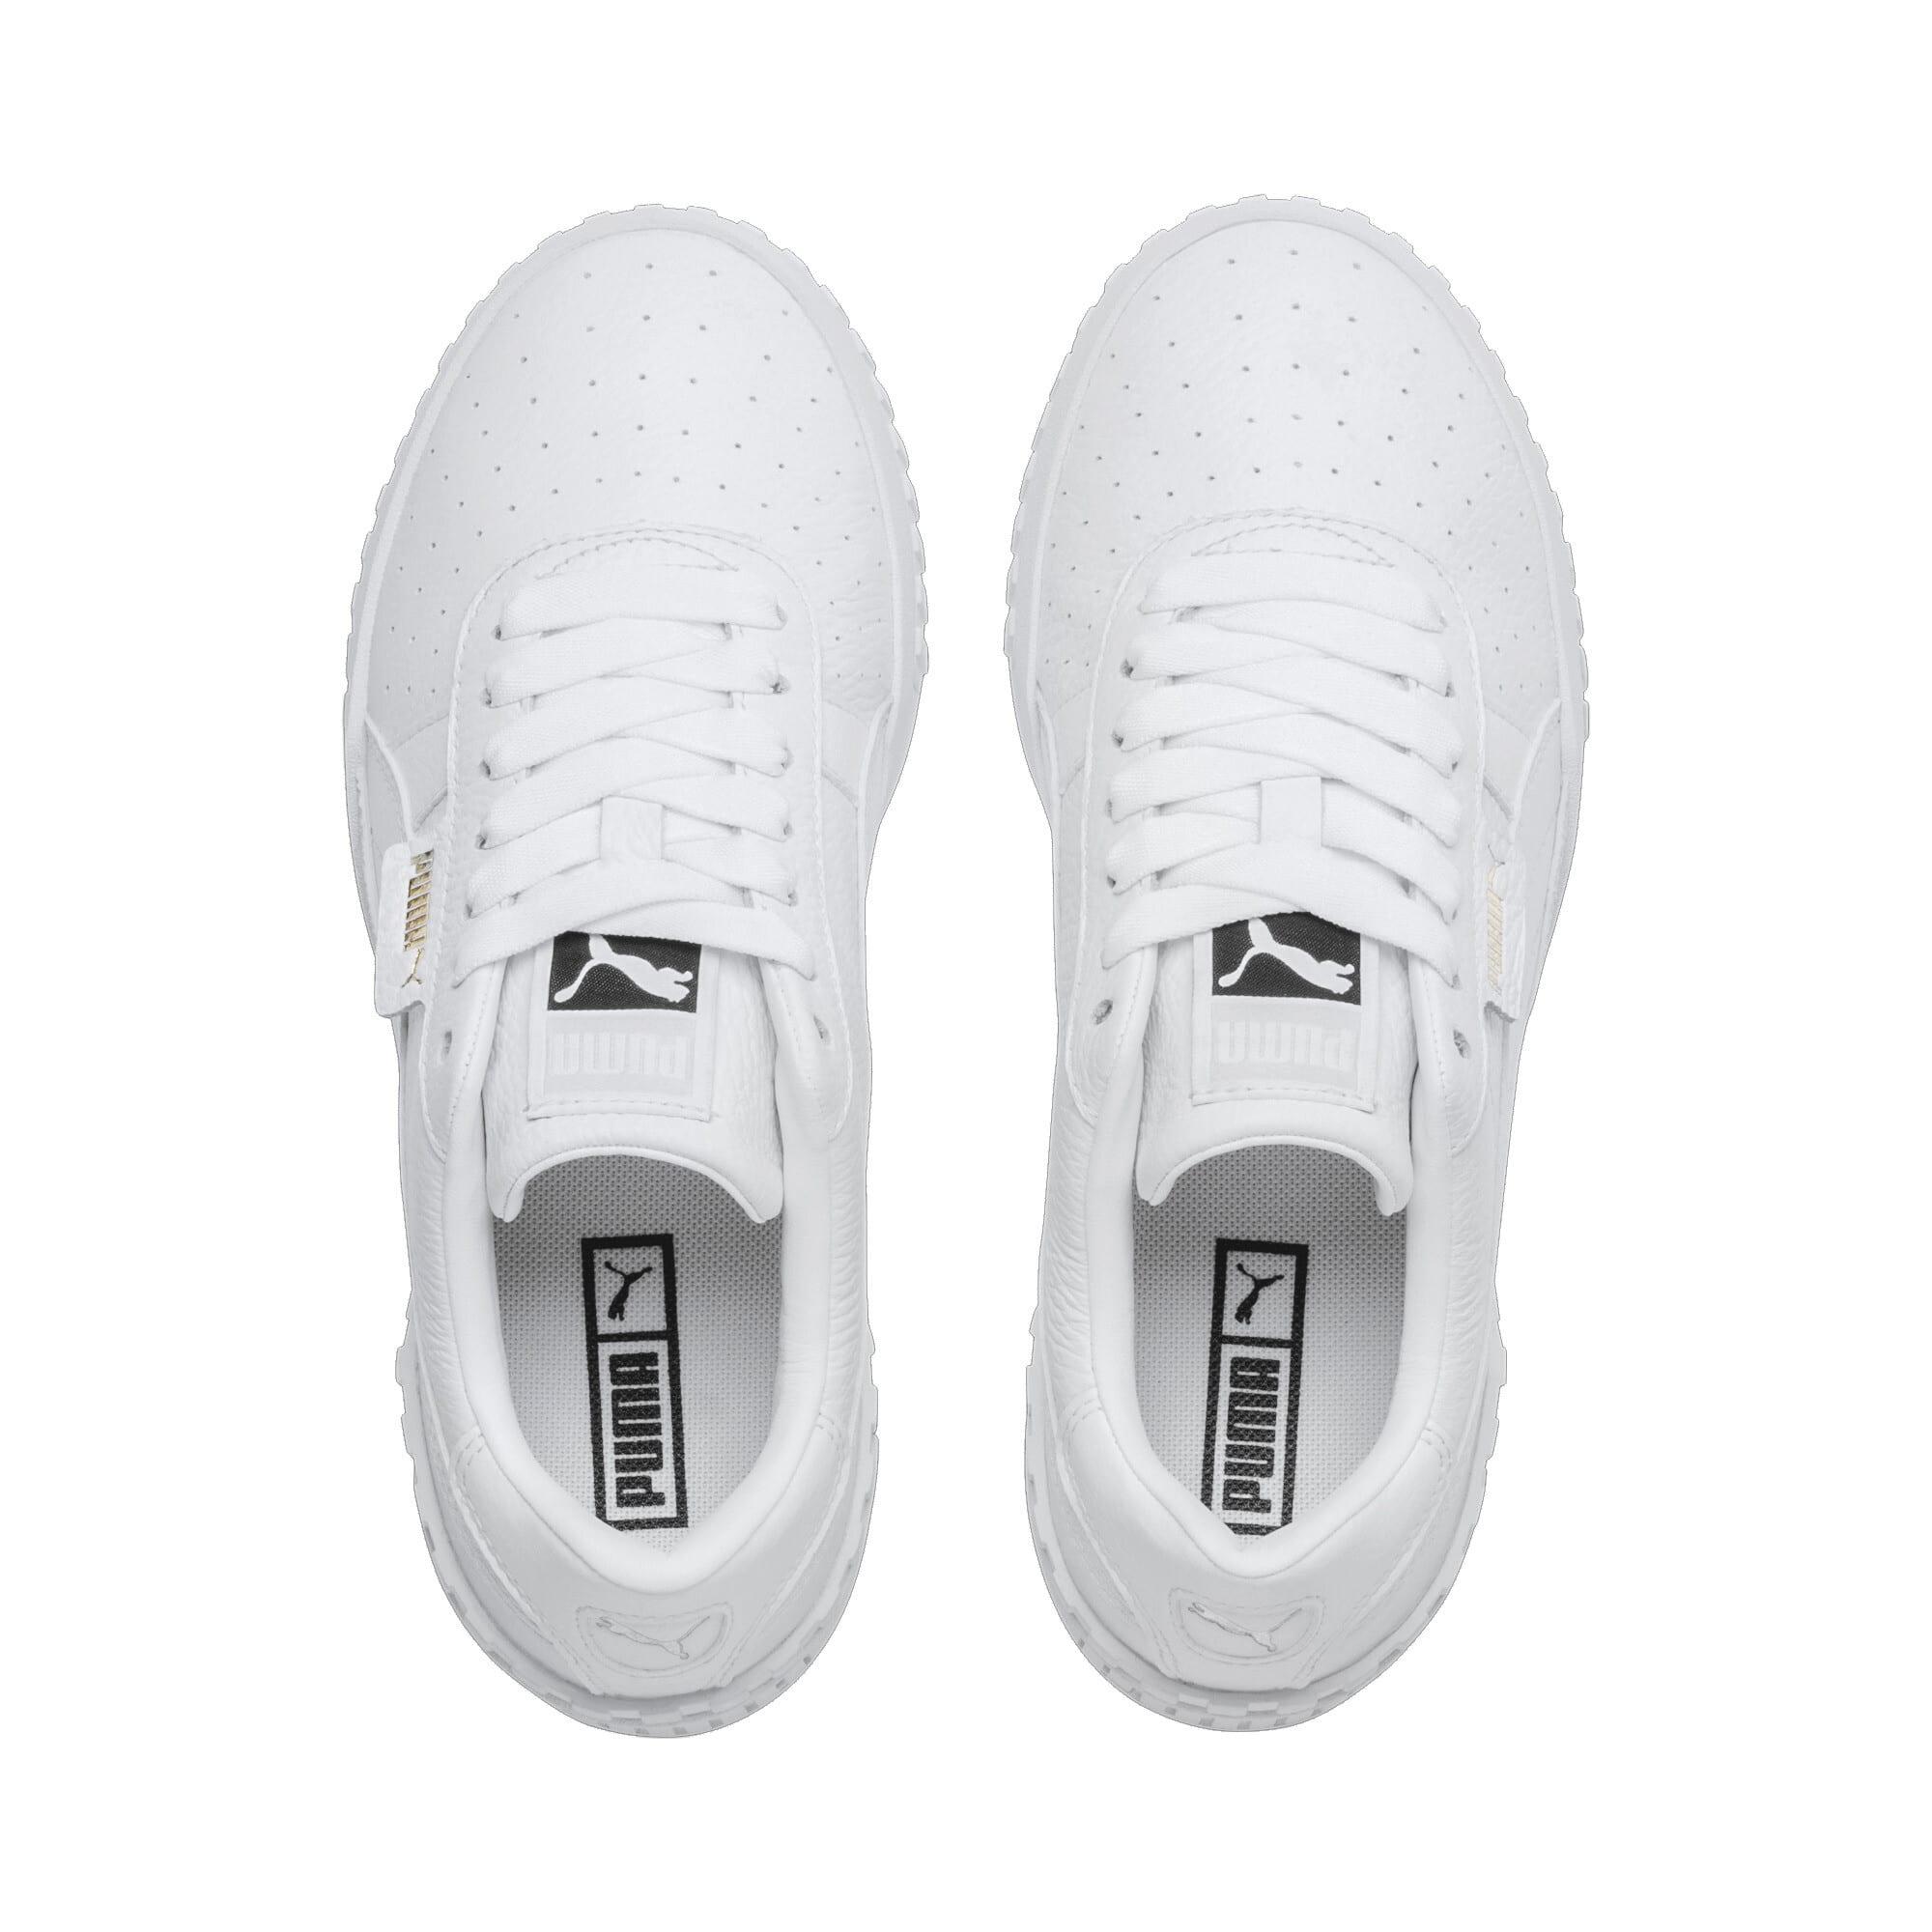 Thumbnail 7 of Cali Women's Sneakers, Puma White-Puma White, medium